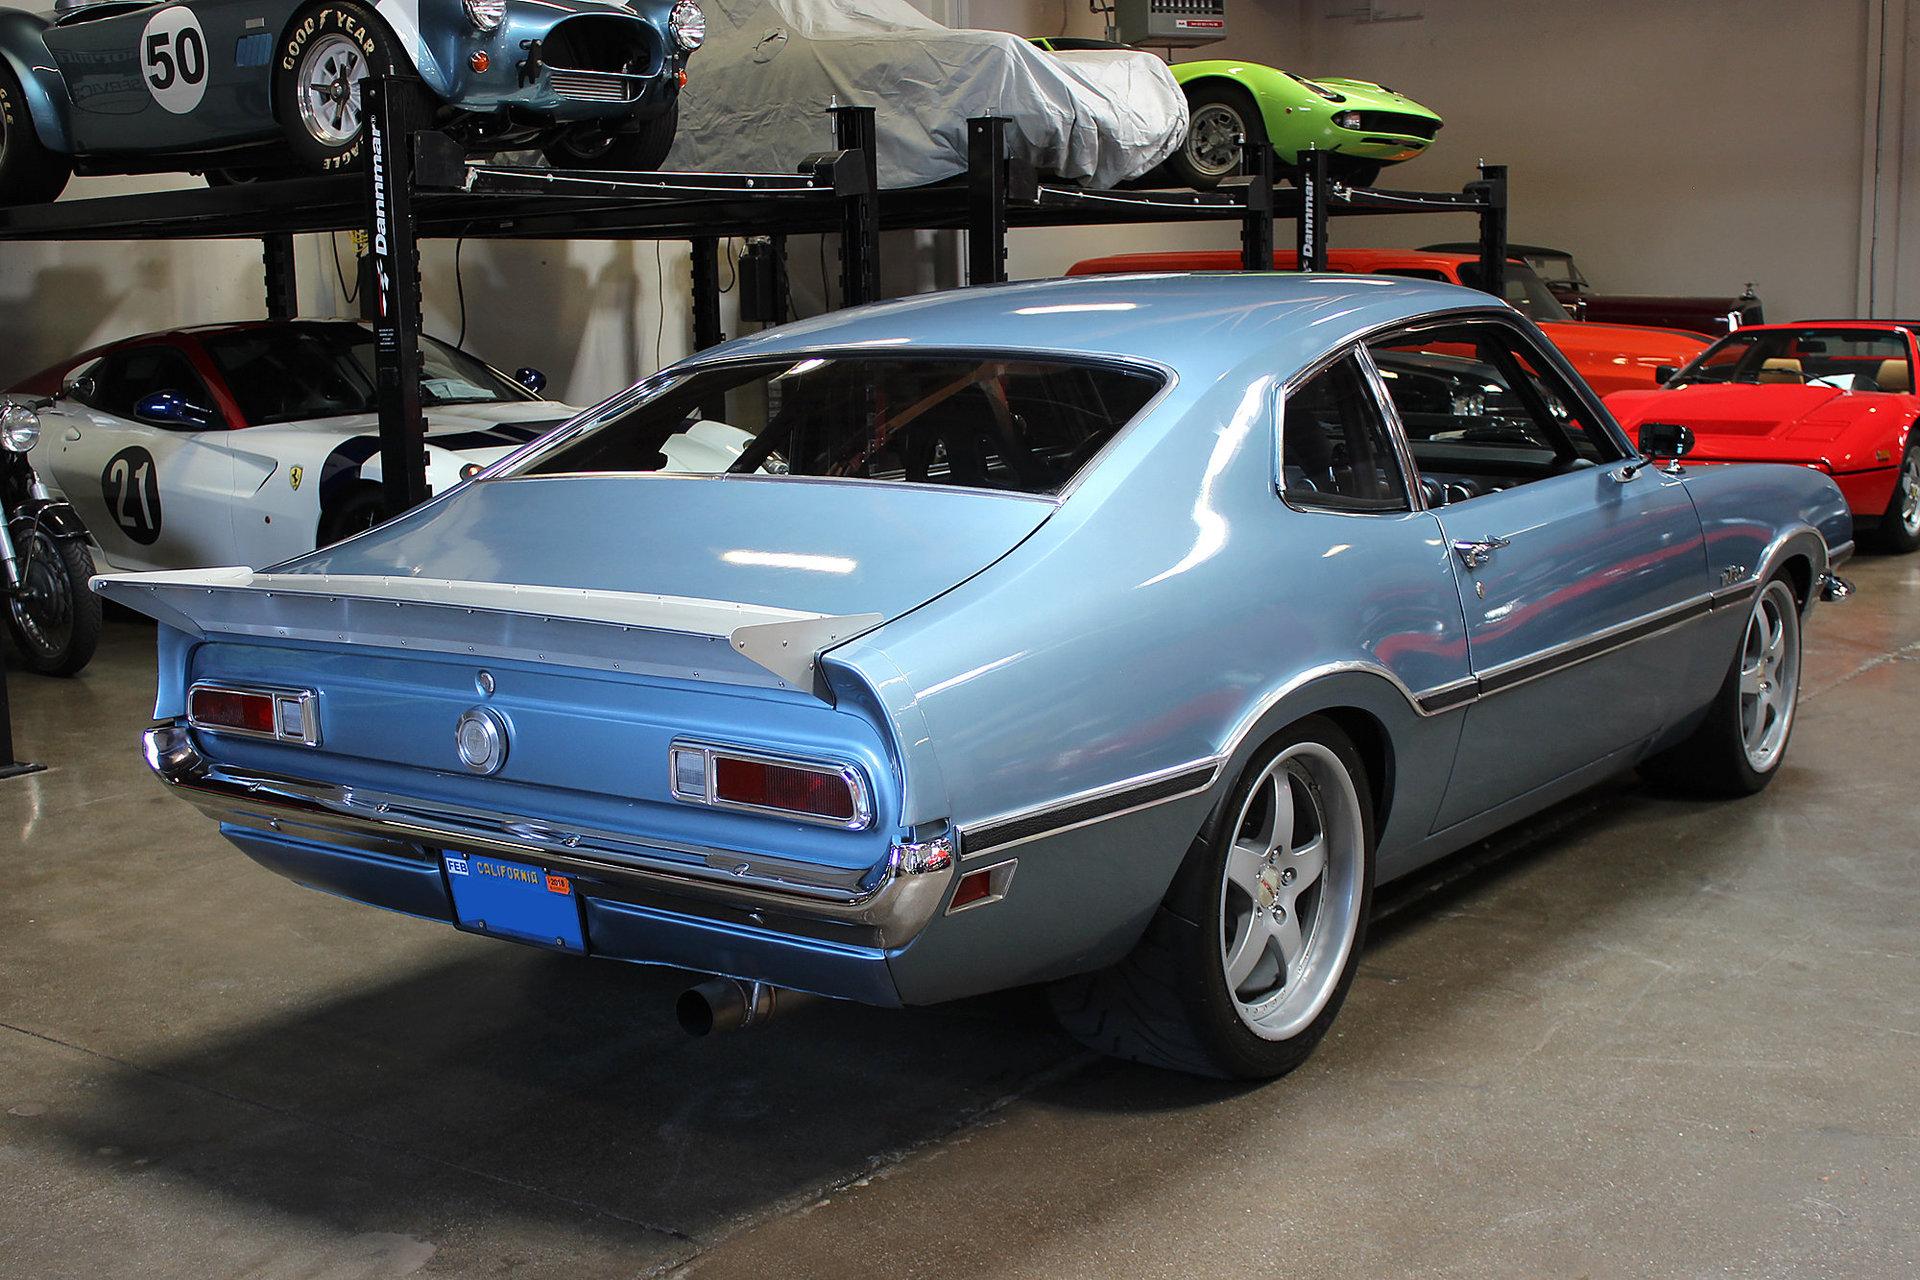 1970 Ford Maverick For Sale #65808